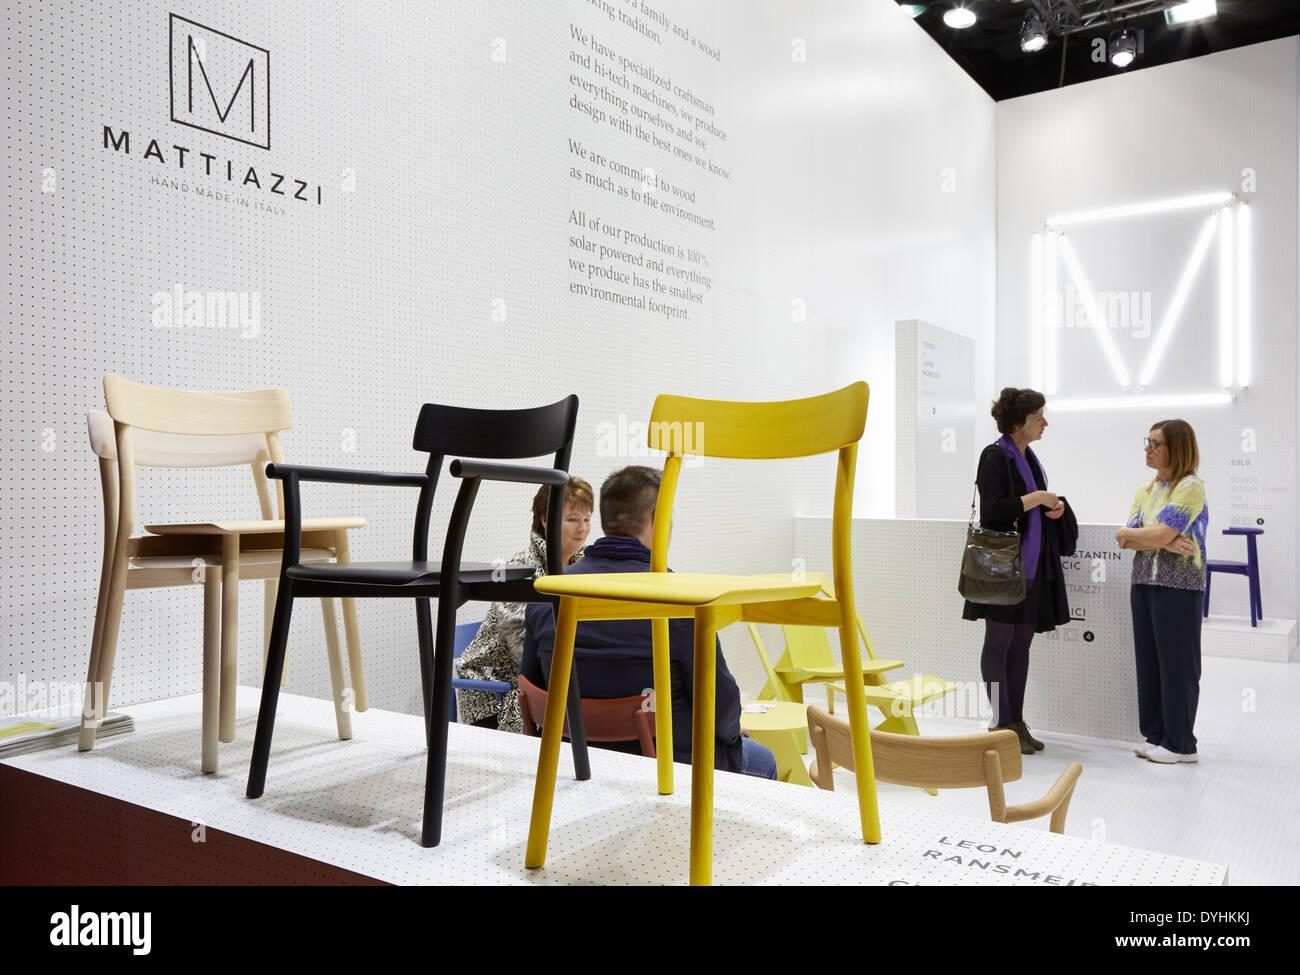 Best Stands Expo Milan : Milan design fair stock photos milan design fair stock images